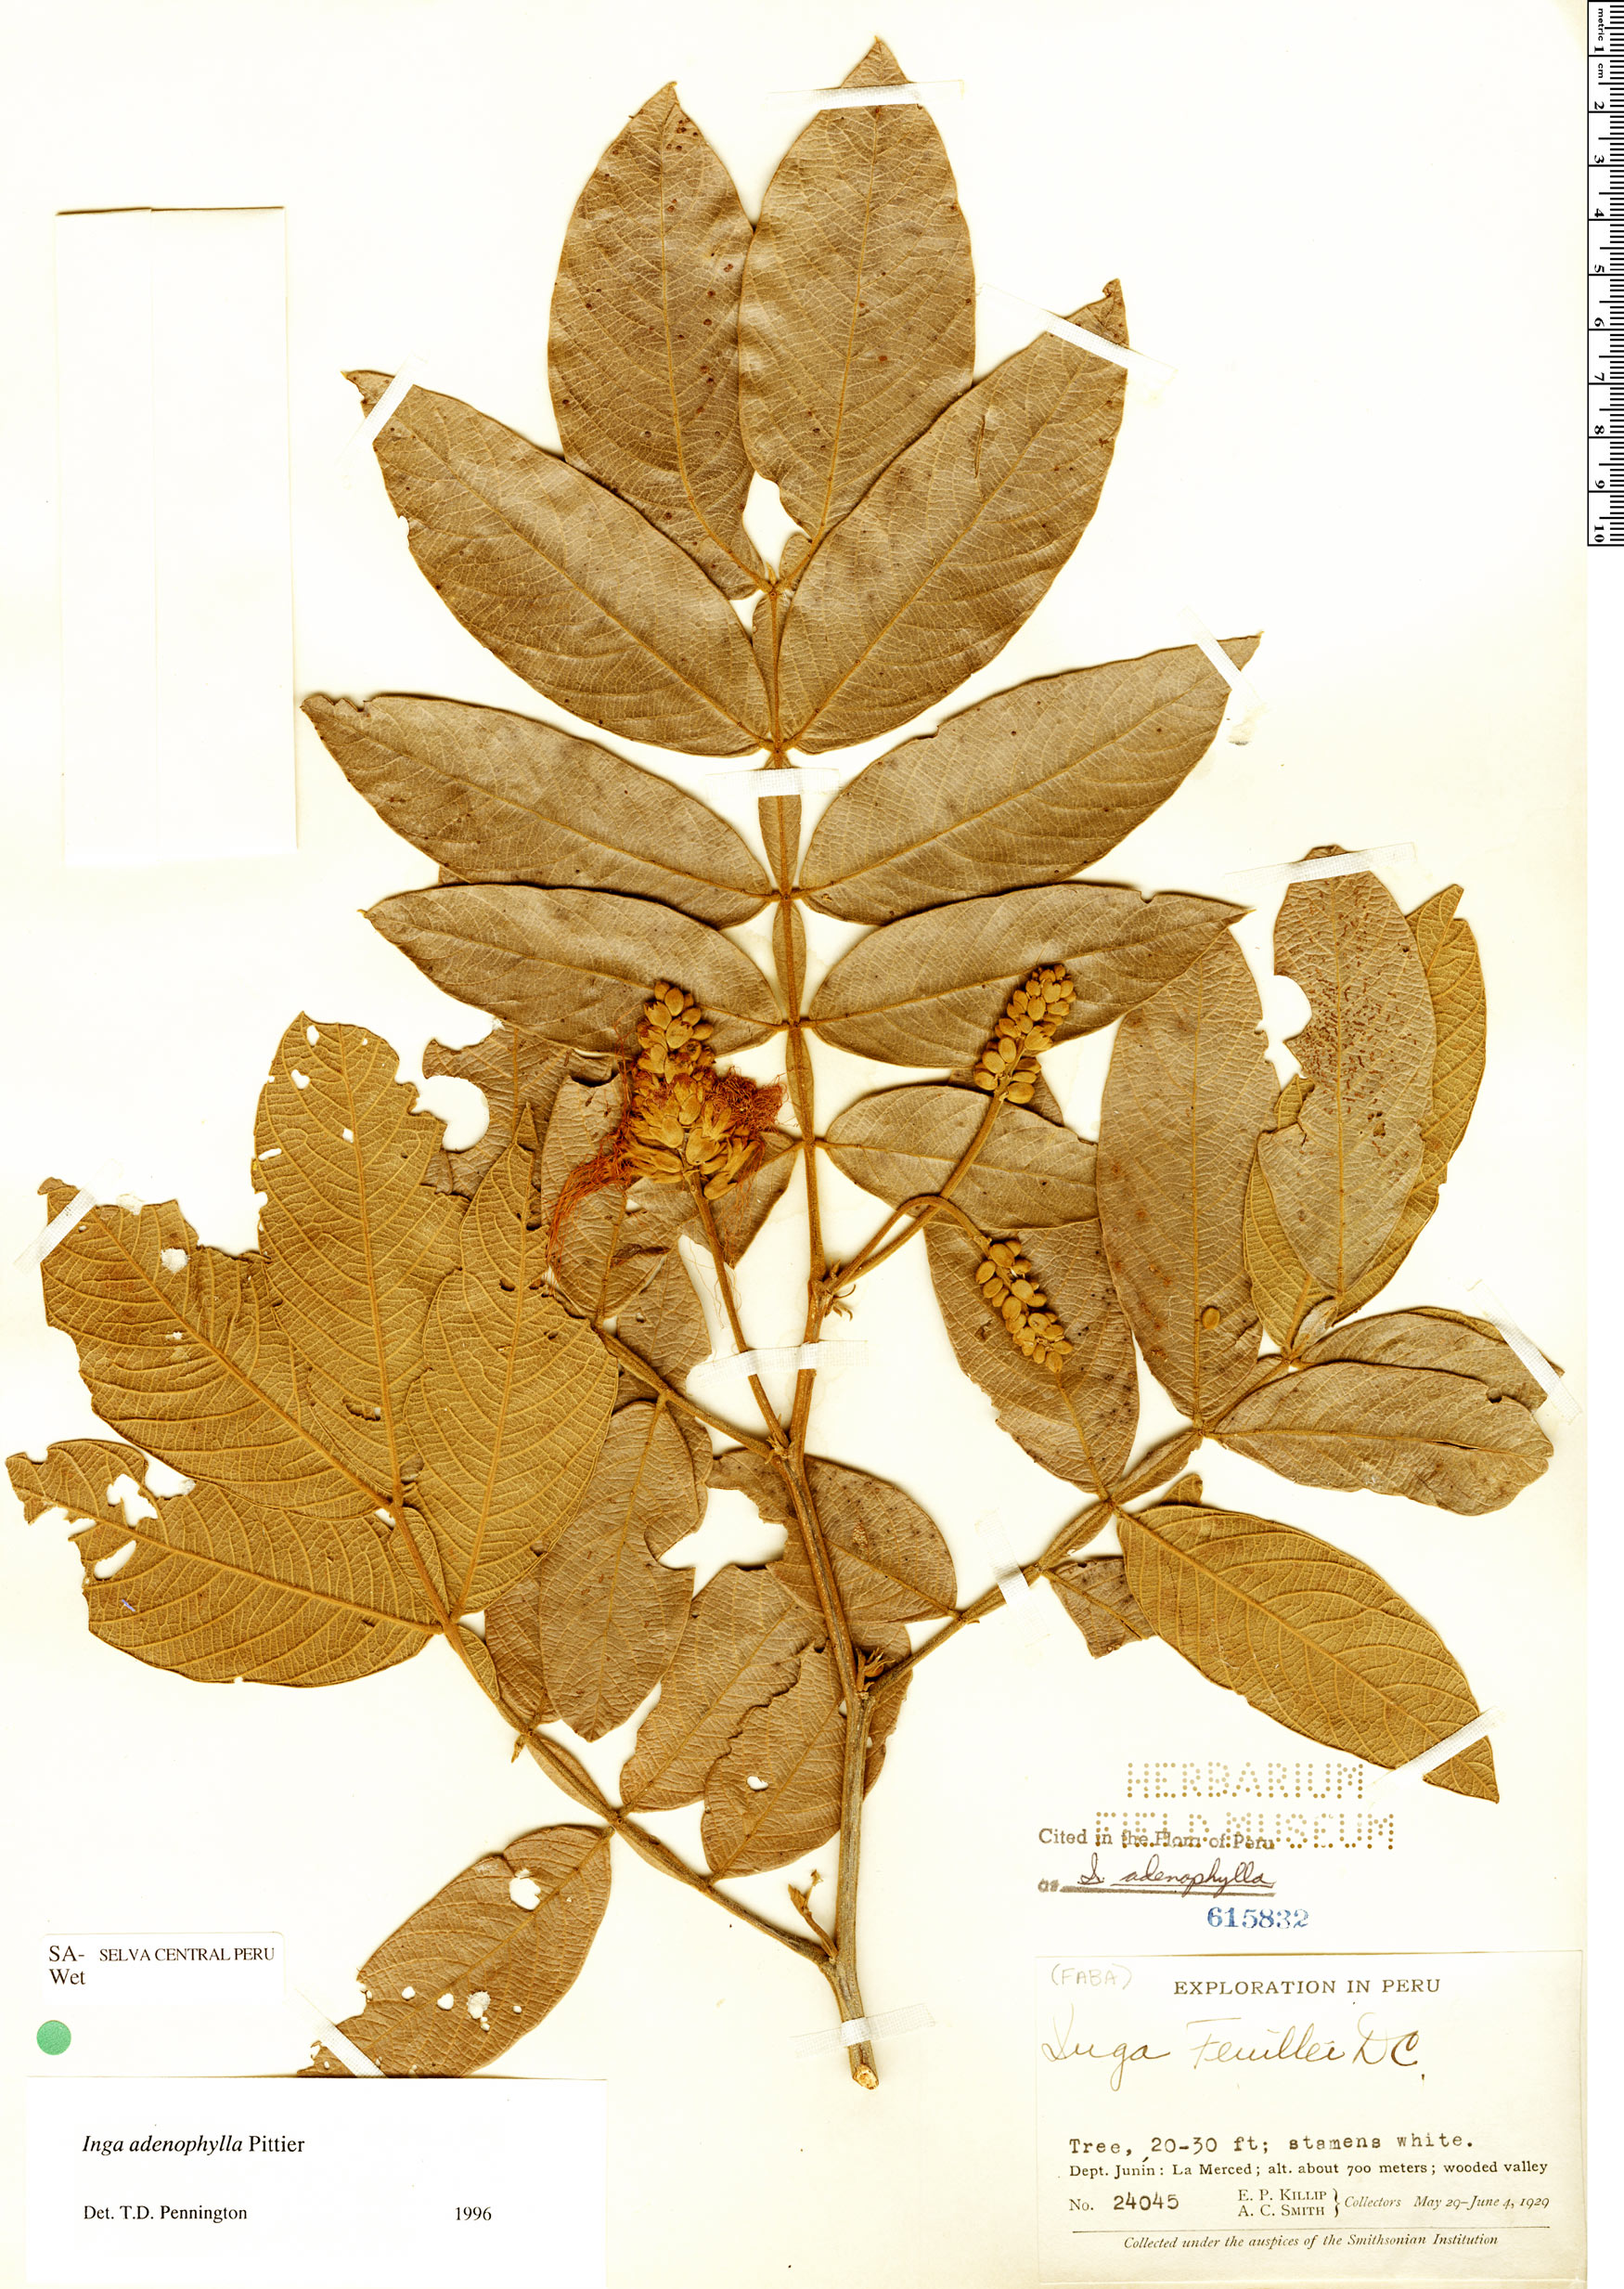 Specimen: Inga adenophylla